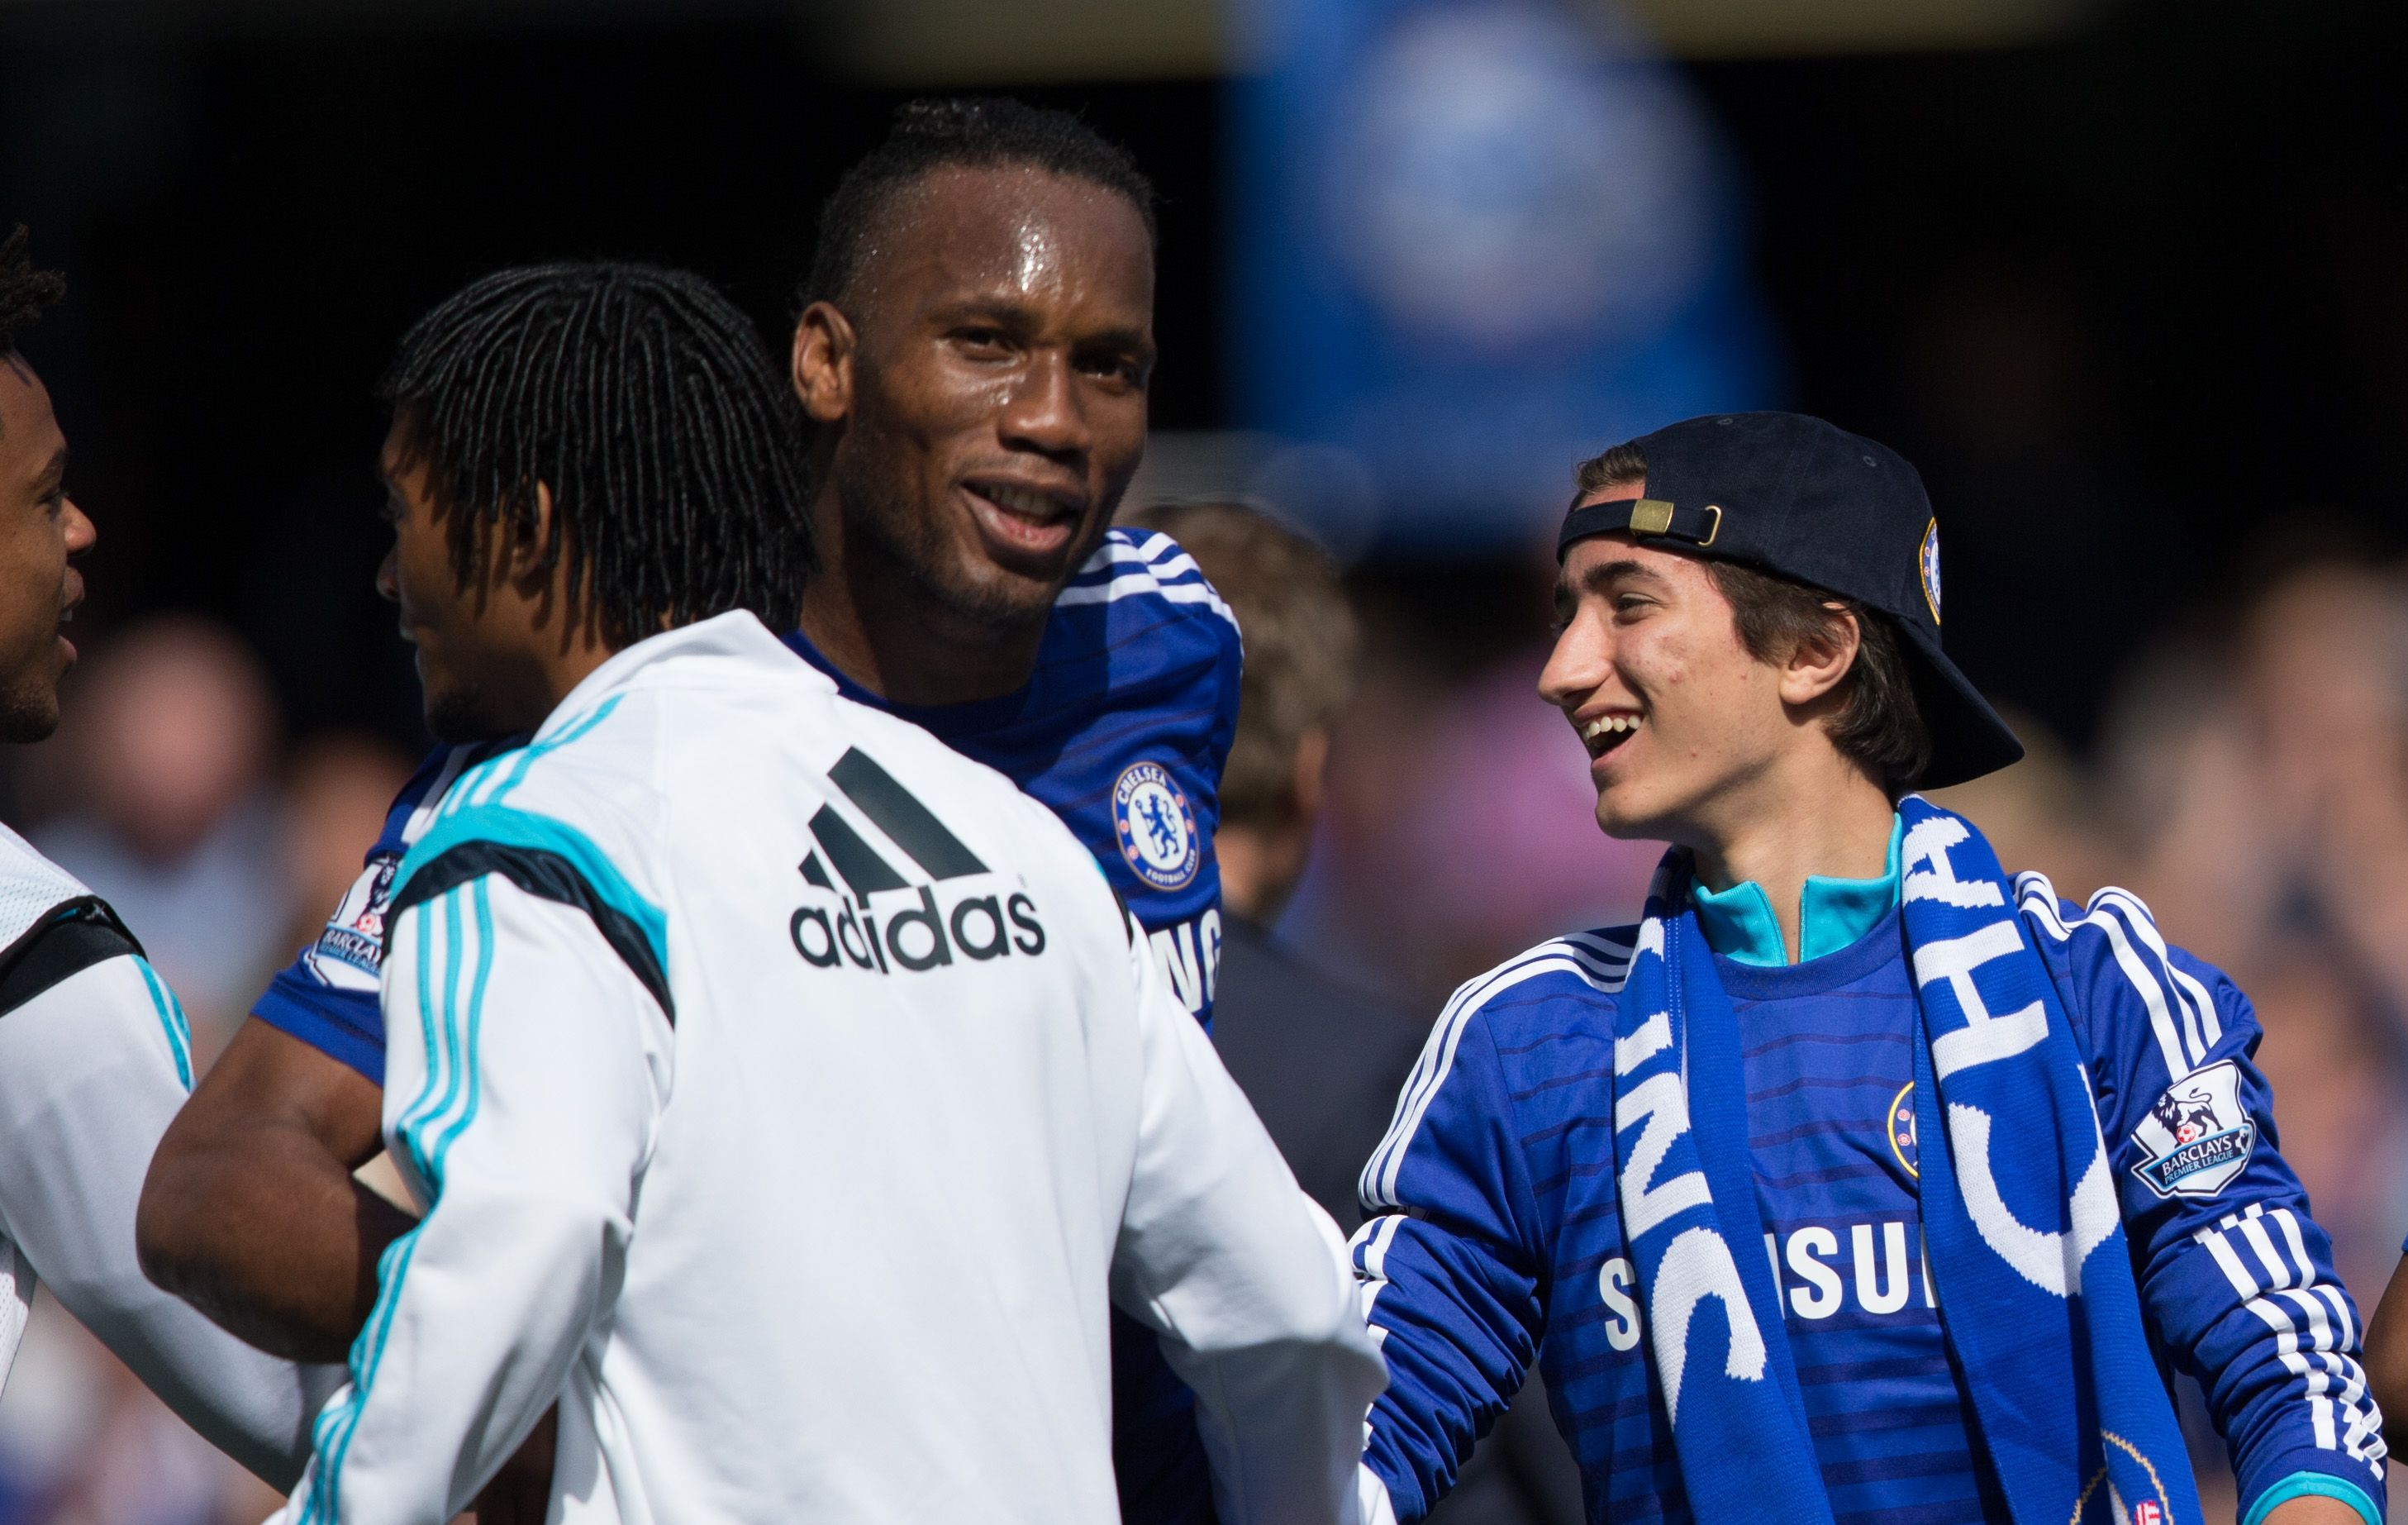 Football - Transferts - Rumeurs du jour : Drogba quitte (encore) Chelsea